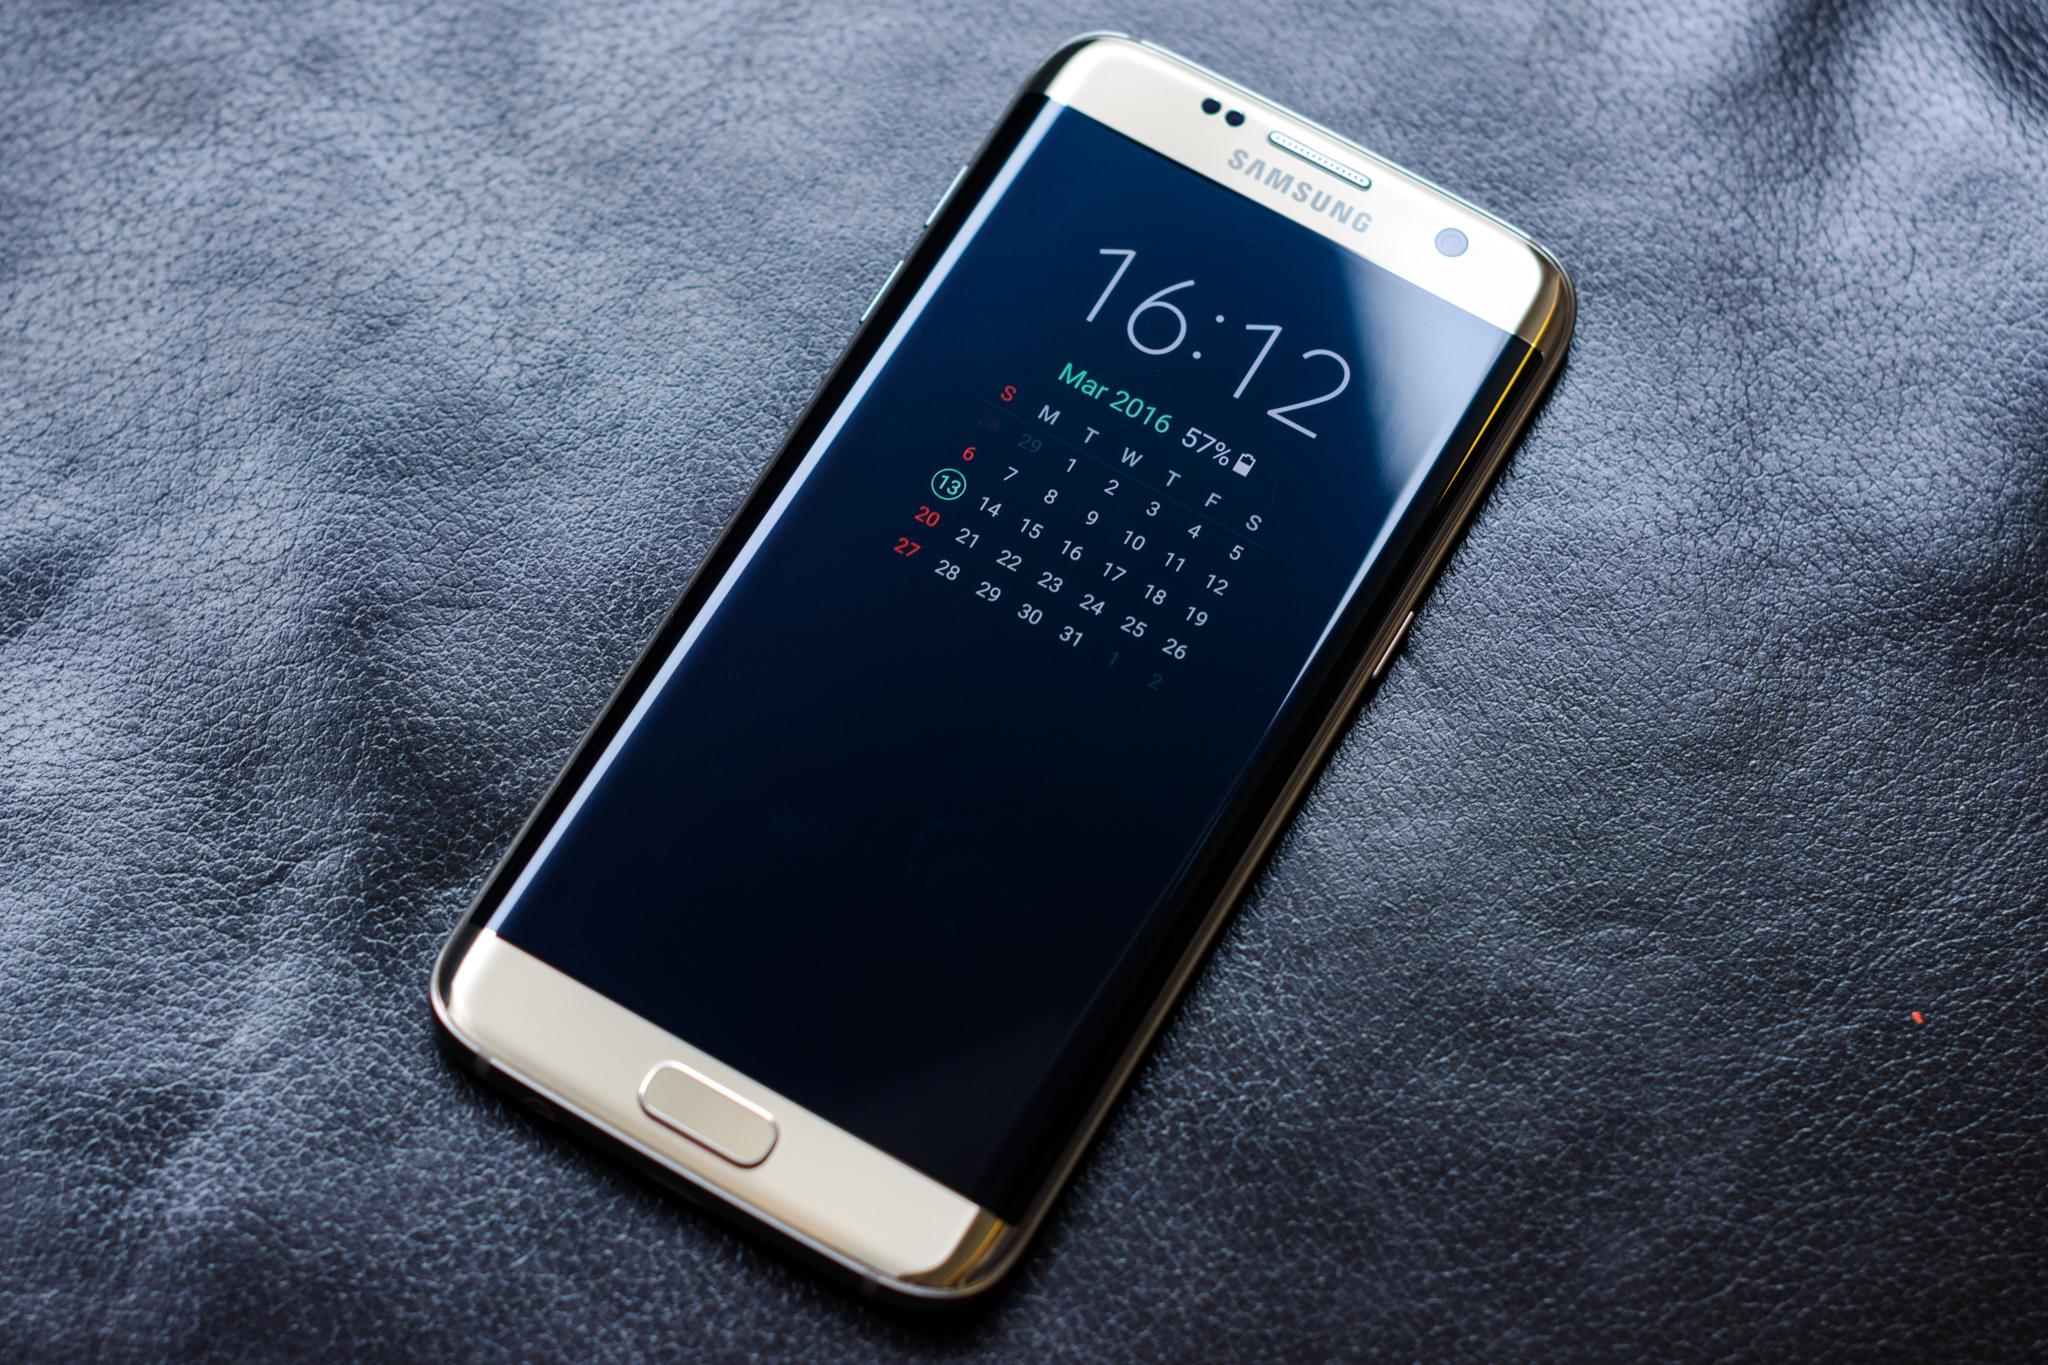 Galaxy S8 Edge News